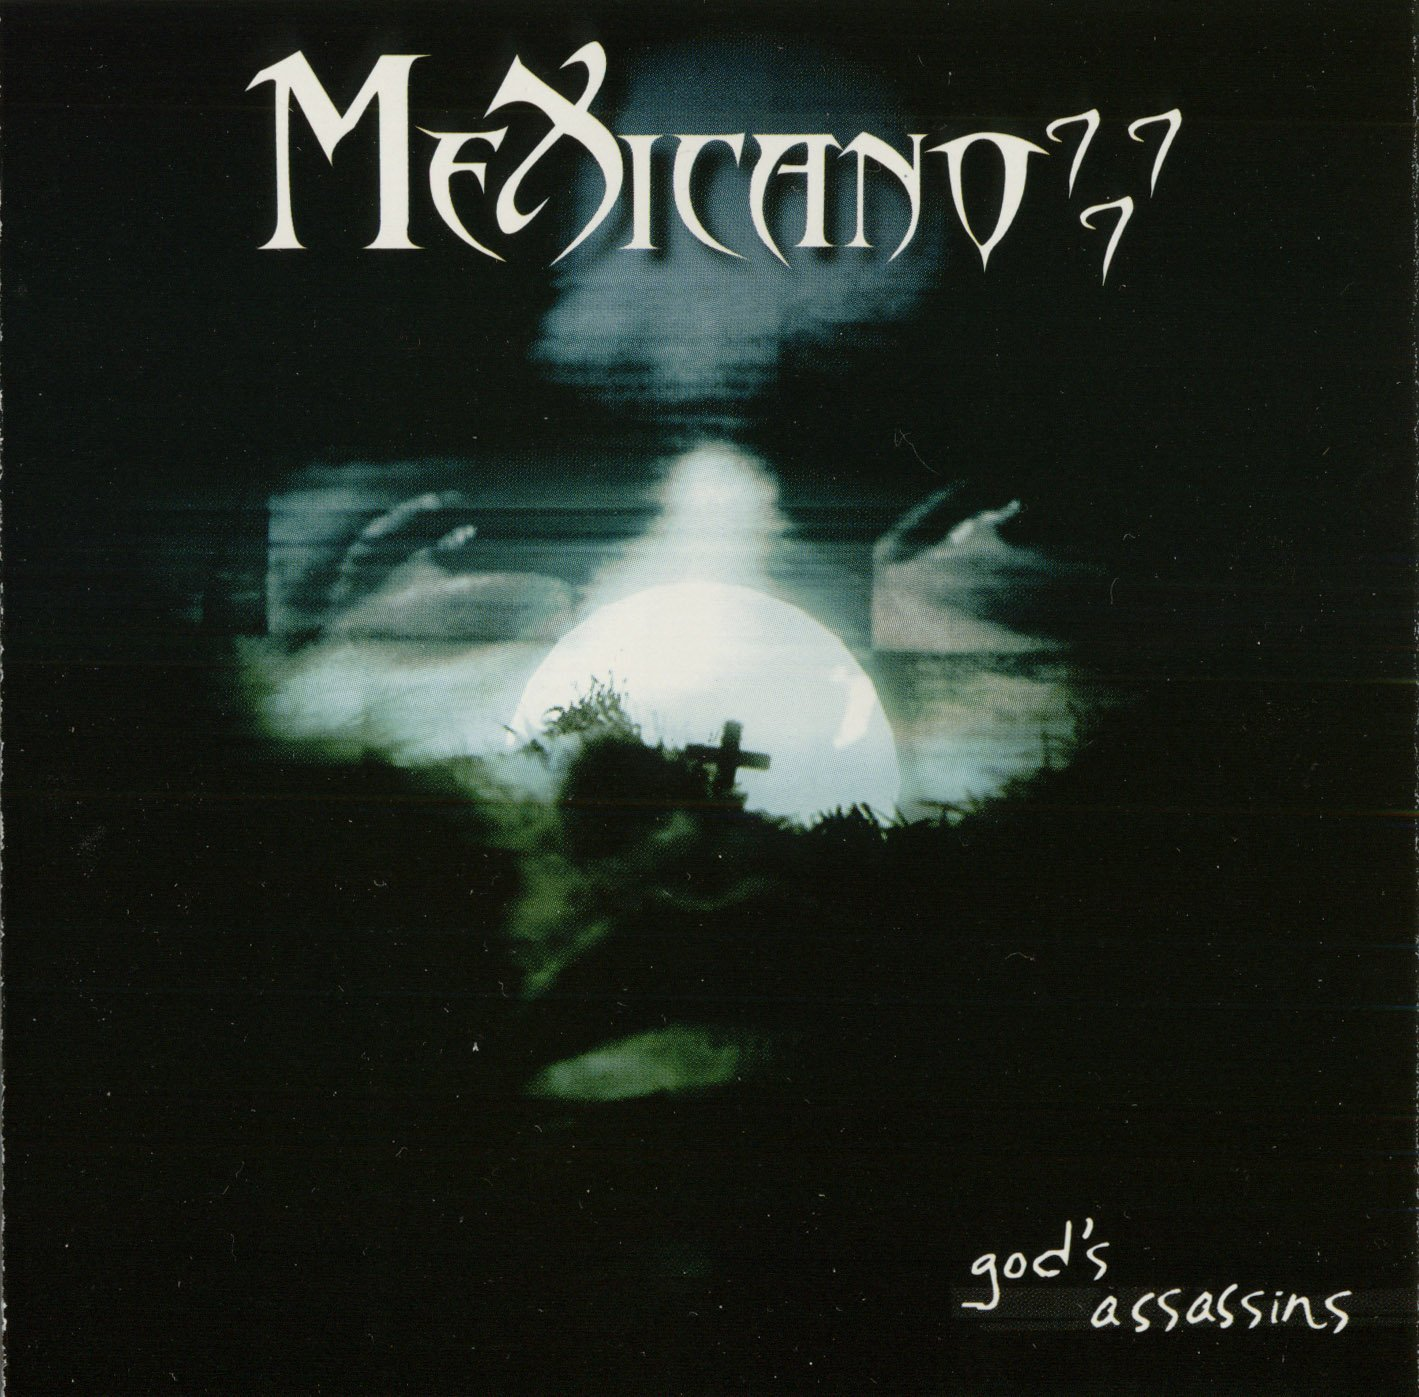 Mexicano 777 album God's Assassins